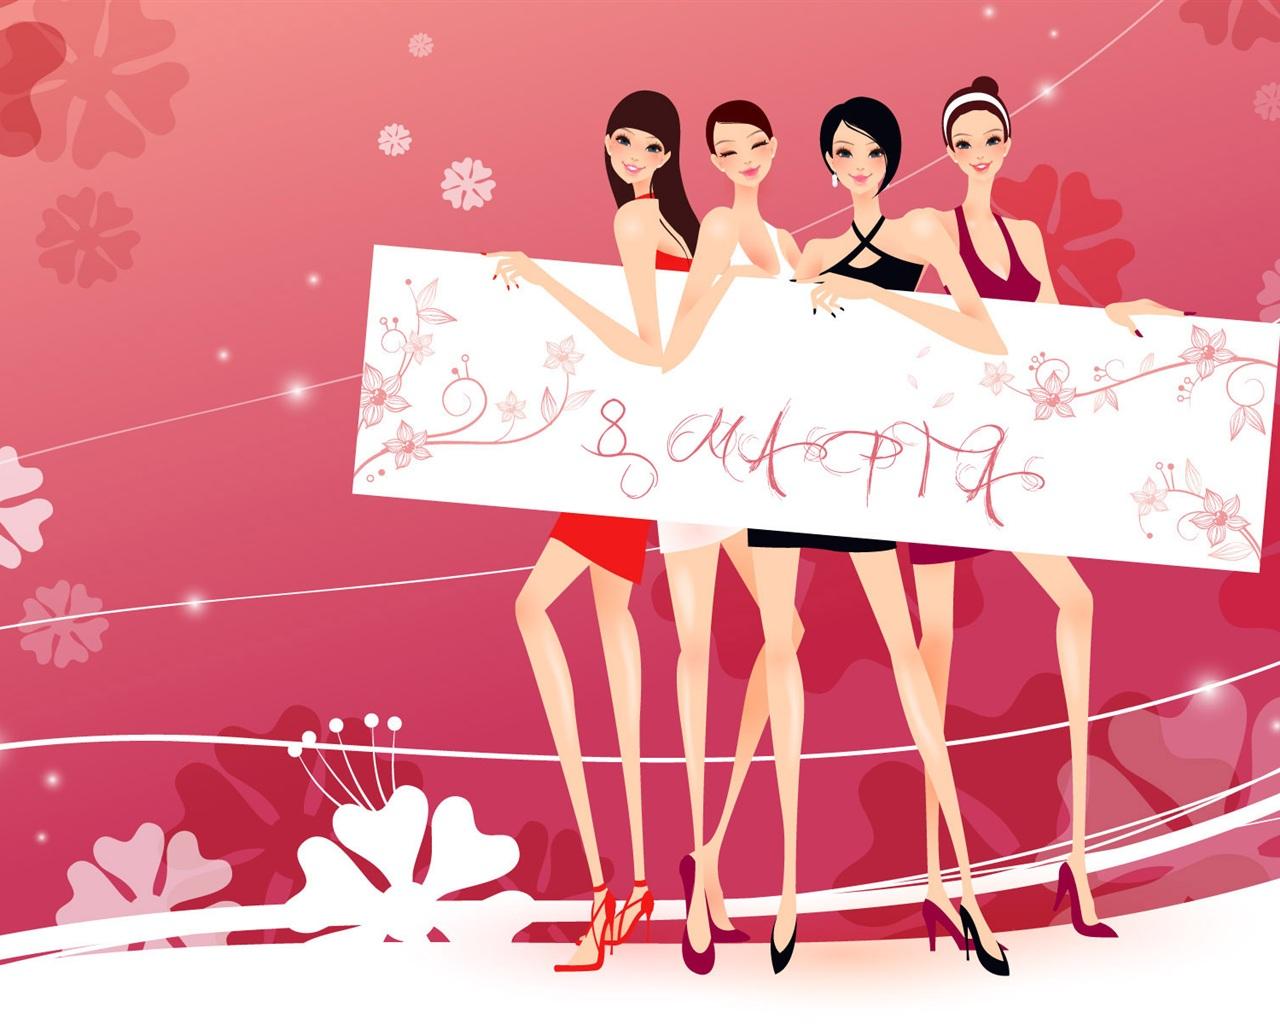 Dia da Mulher (8 de Março) Happy-Women-s-Day-March-8_1280x1024